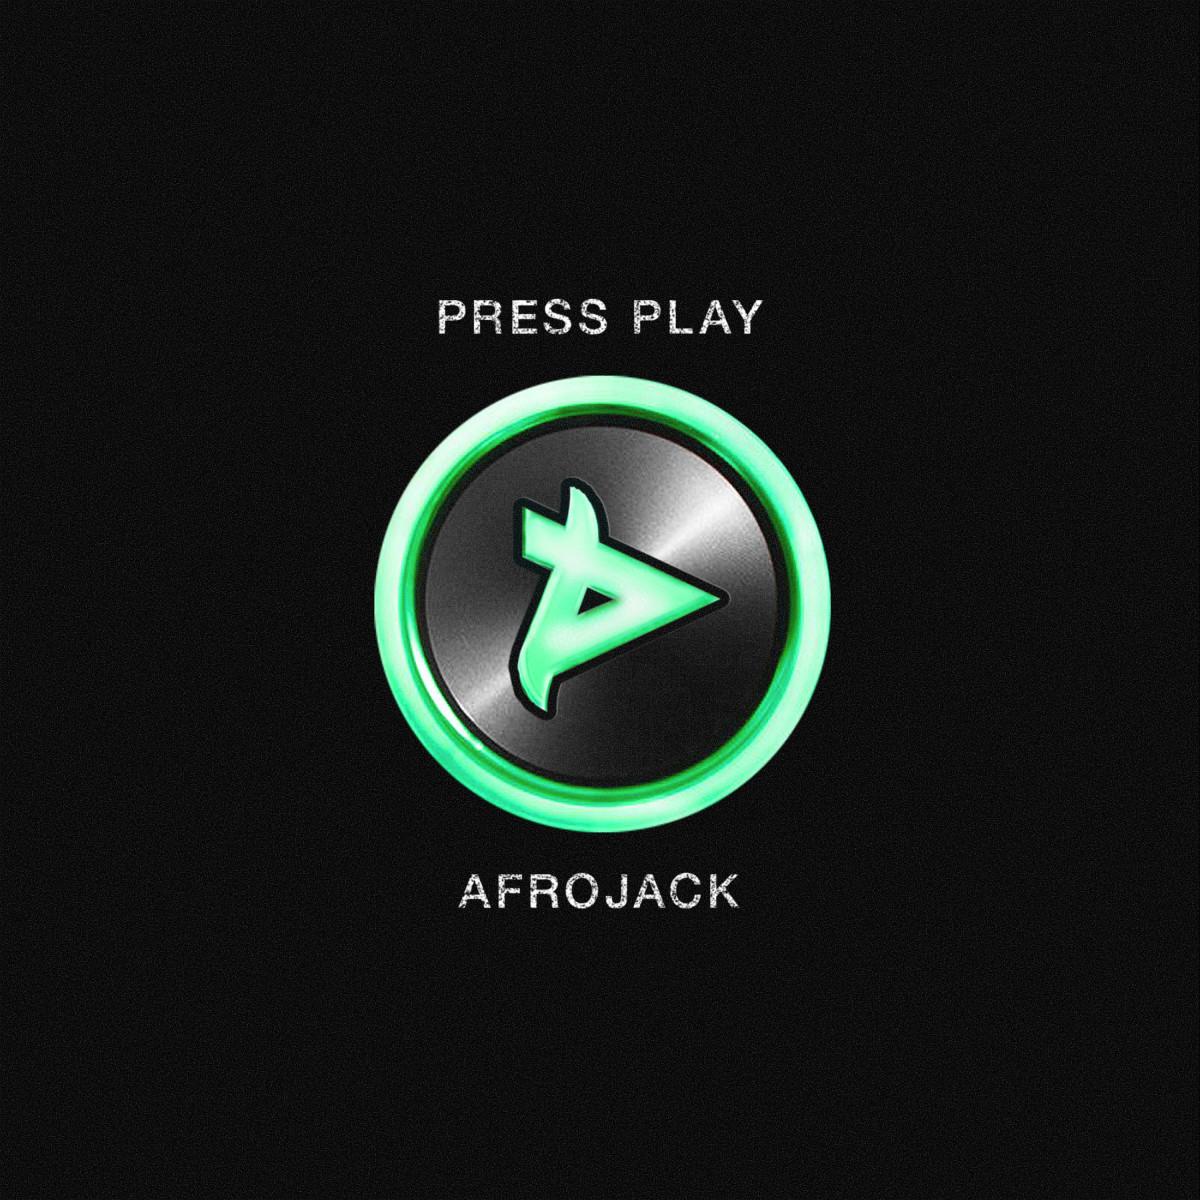 Afrojack_PressPlayEP_FinalCover (2)